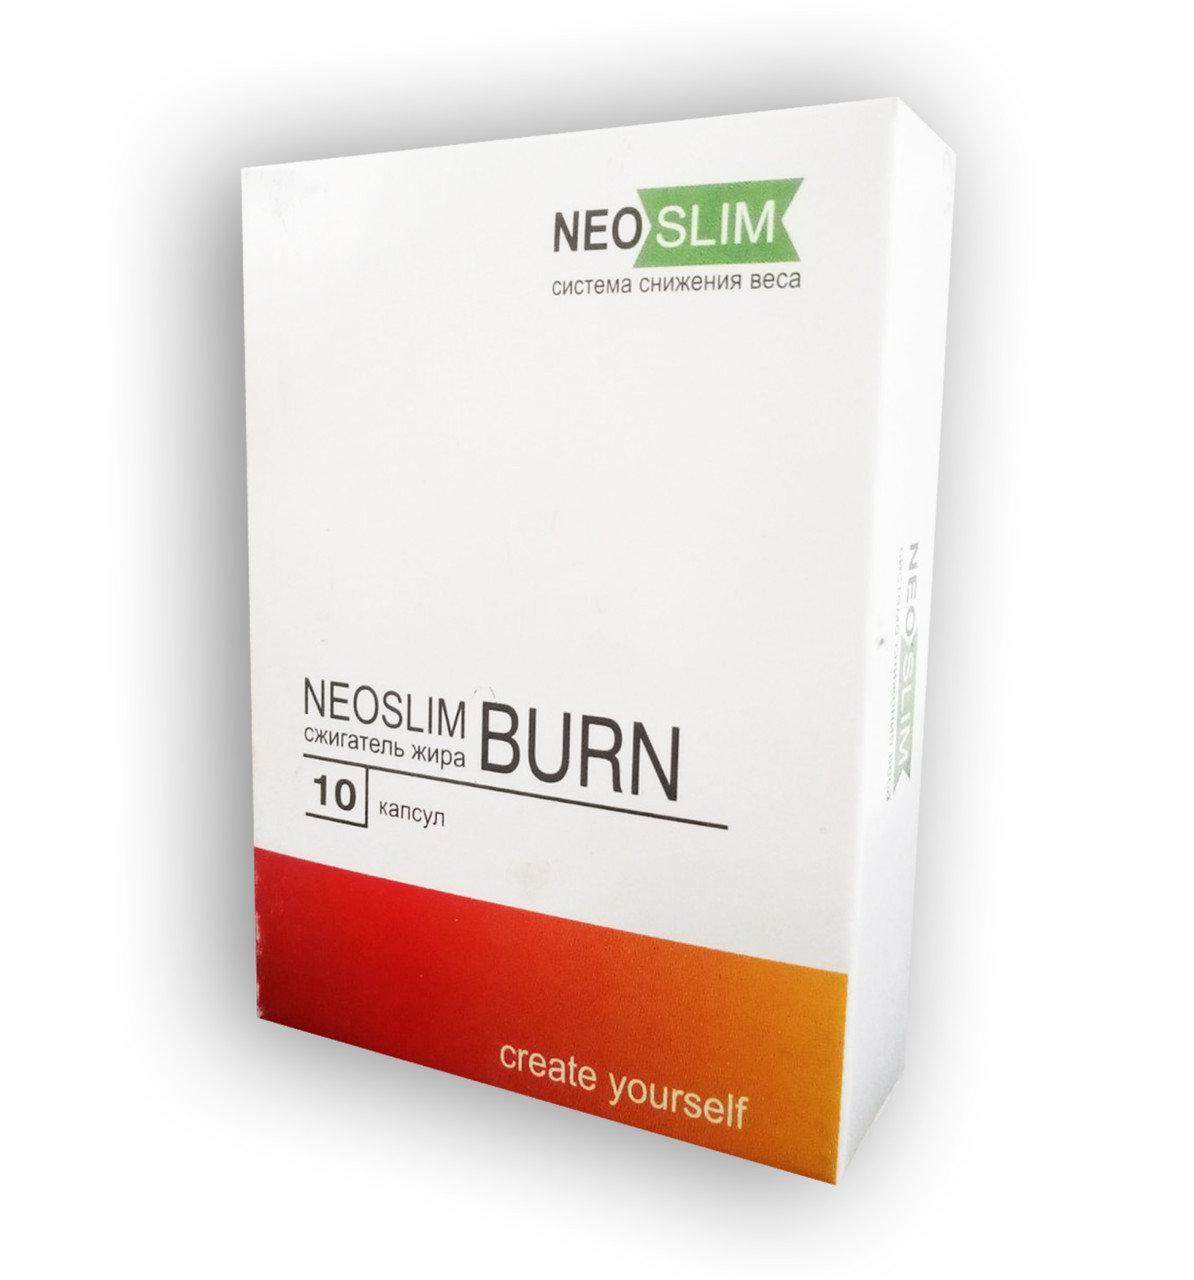 Neo Slim Burn (10)  - Комплекс для снижения веса (Нео Слим Бёрн)